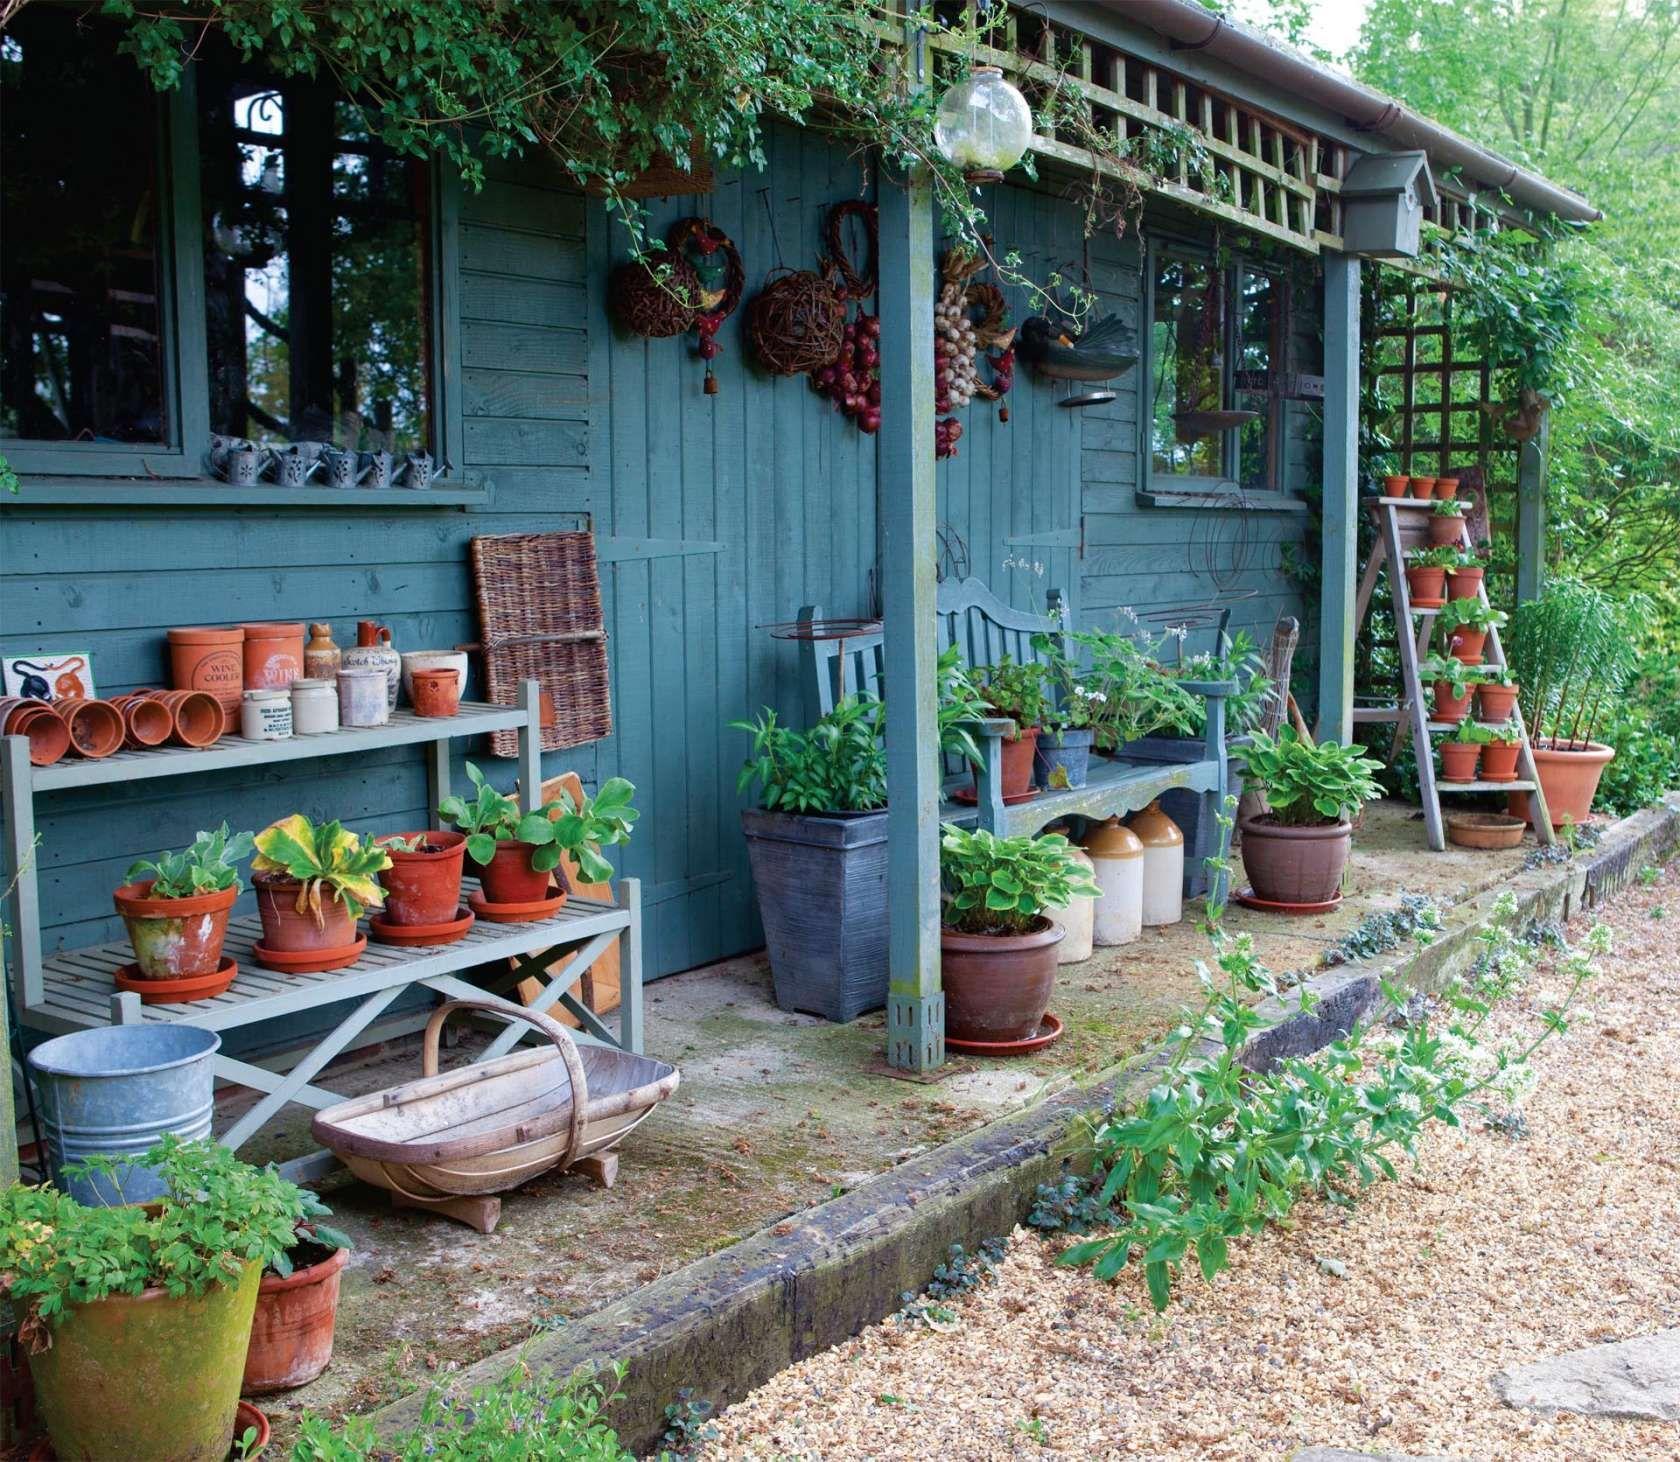 A Year-round Country Garden